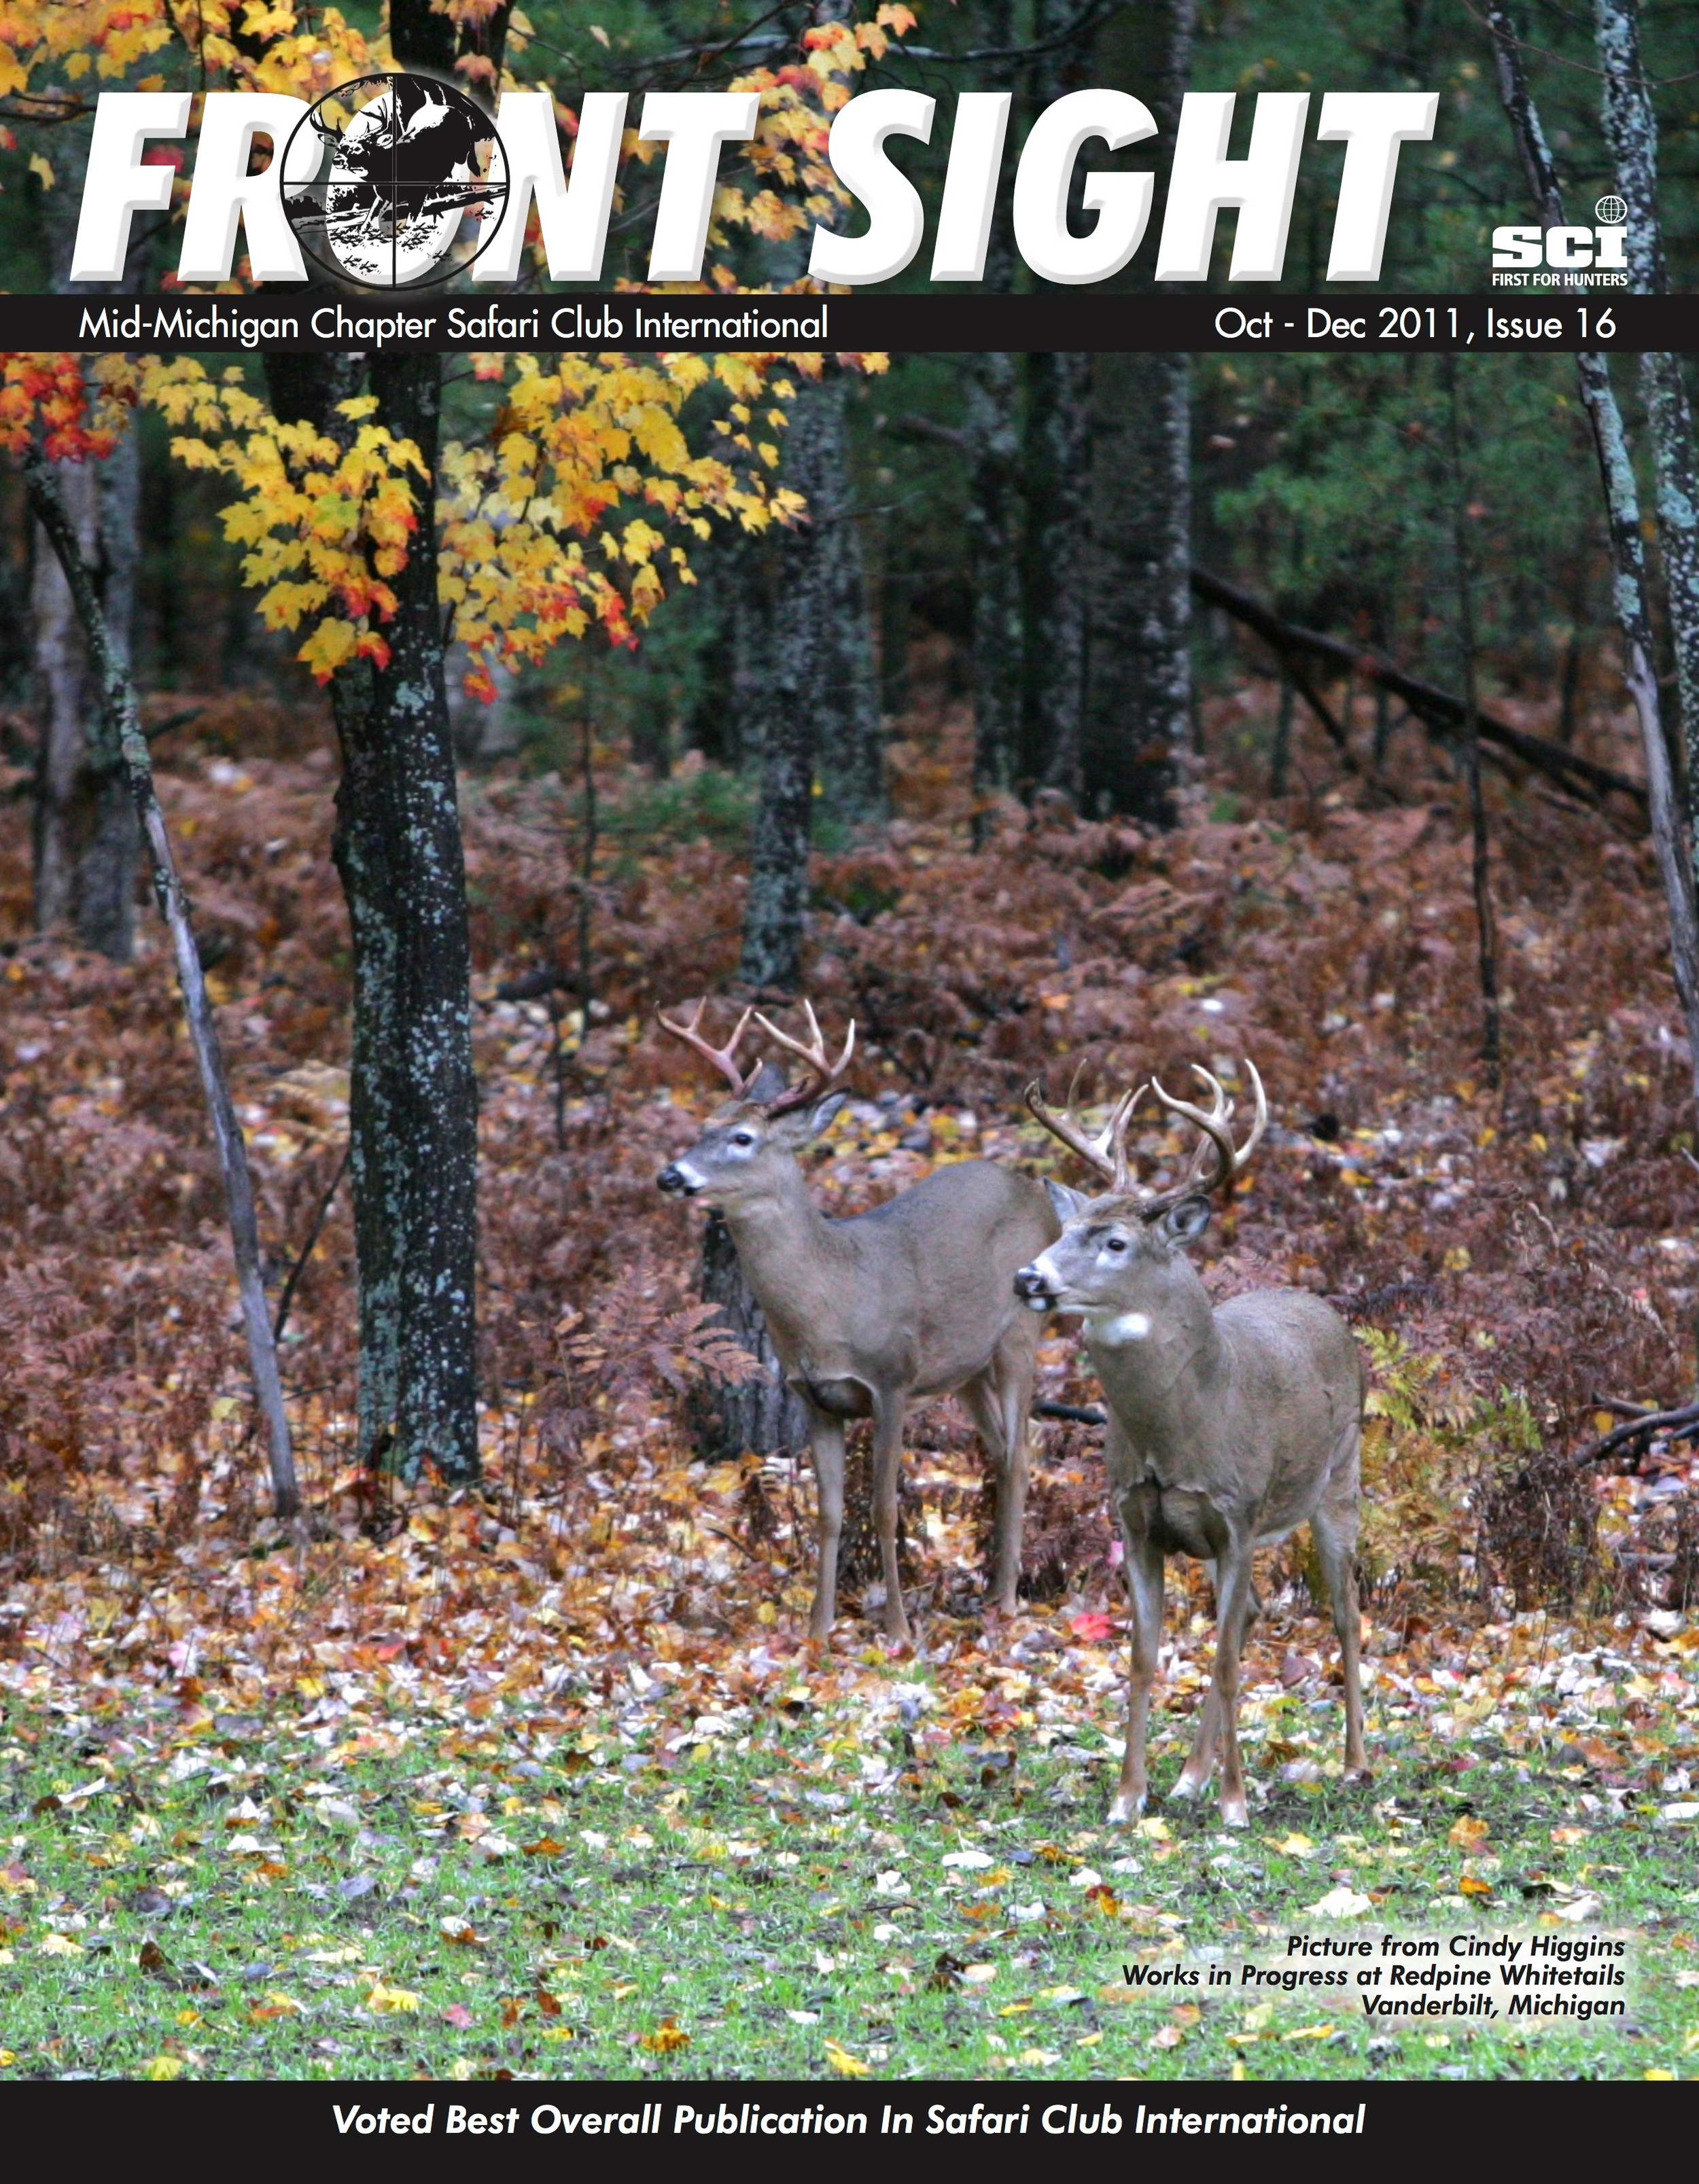 Issue 16, October 2011